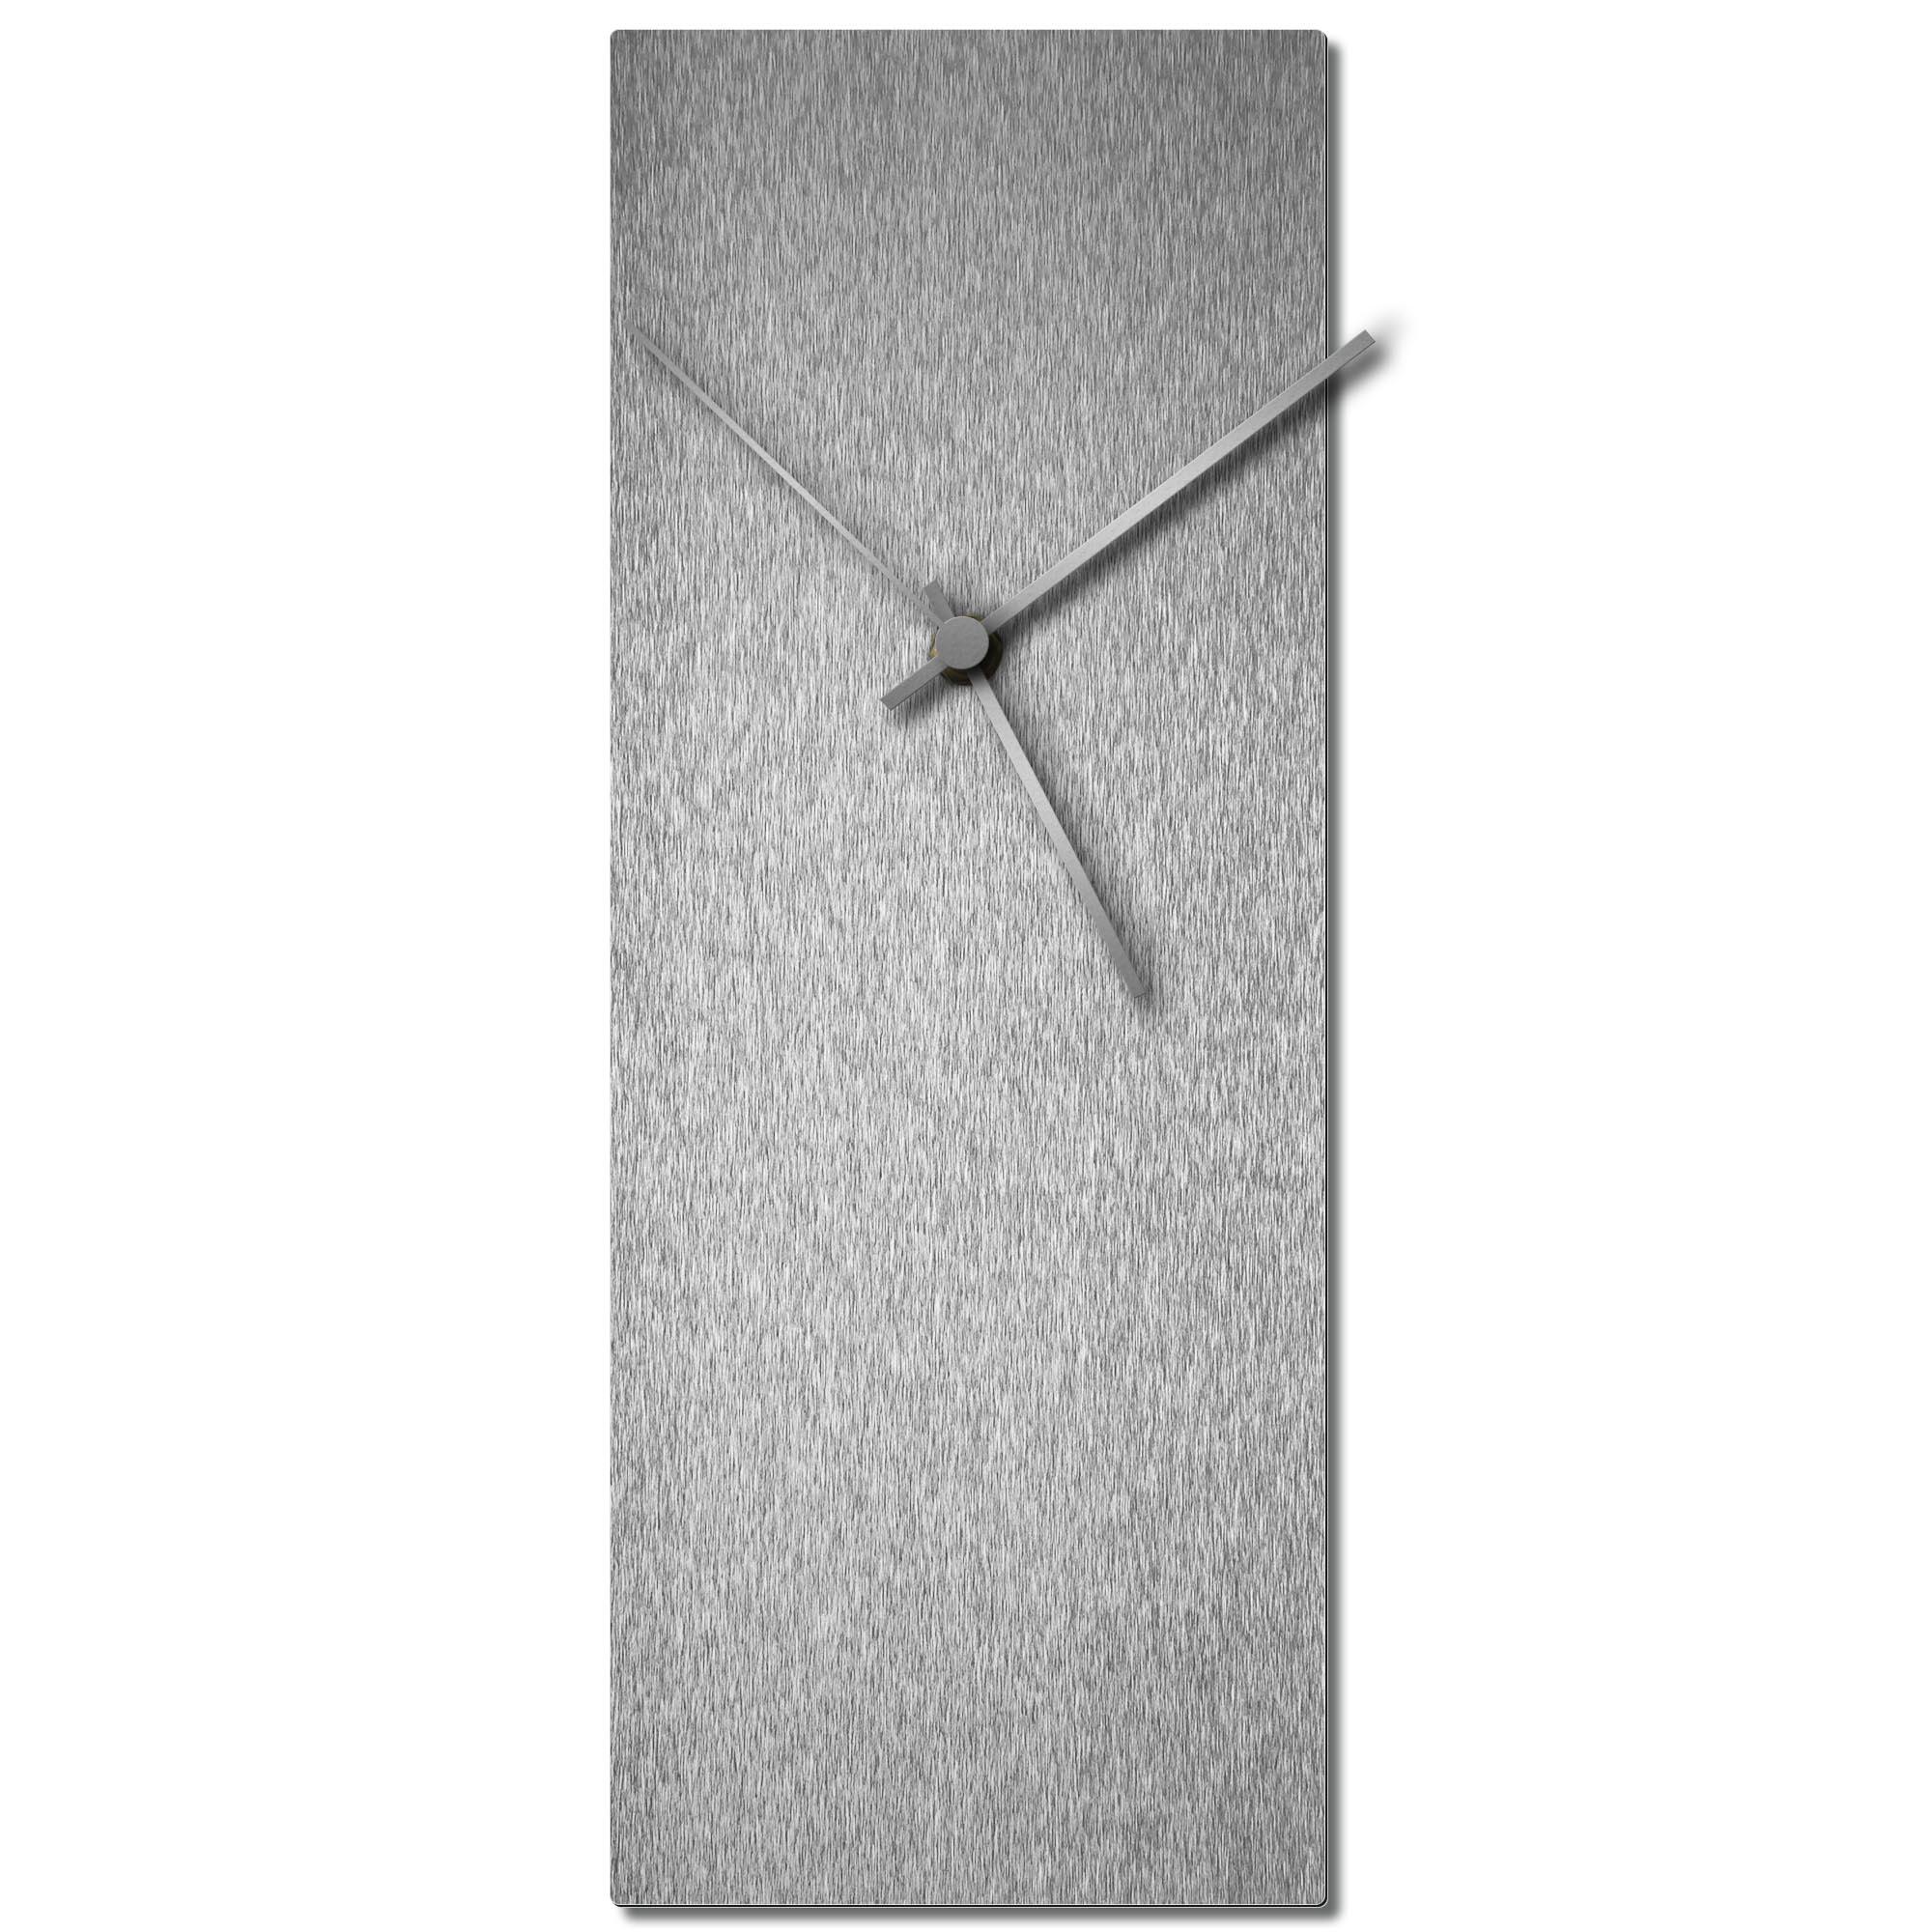 Adam Schwoeppe 'Silversmith Clock Silver' Midcentury Modern Style Wall Clock